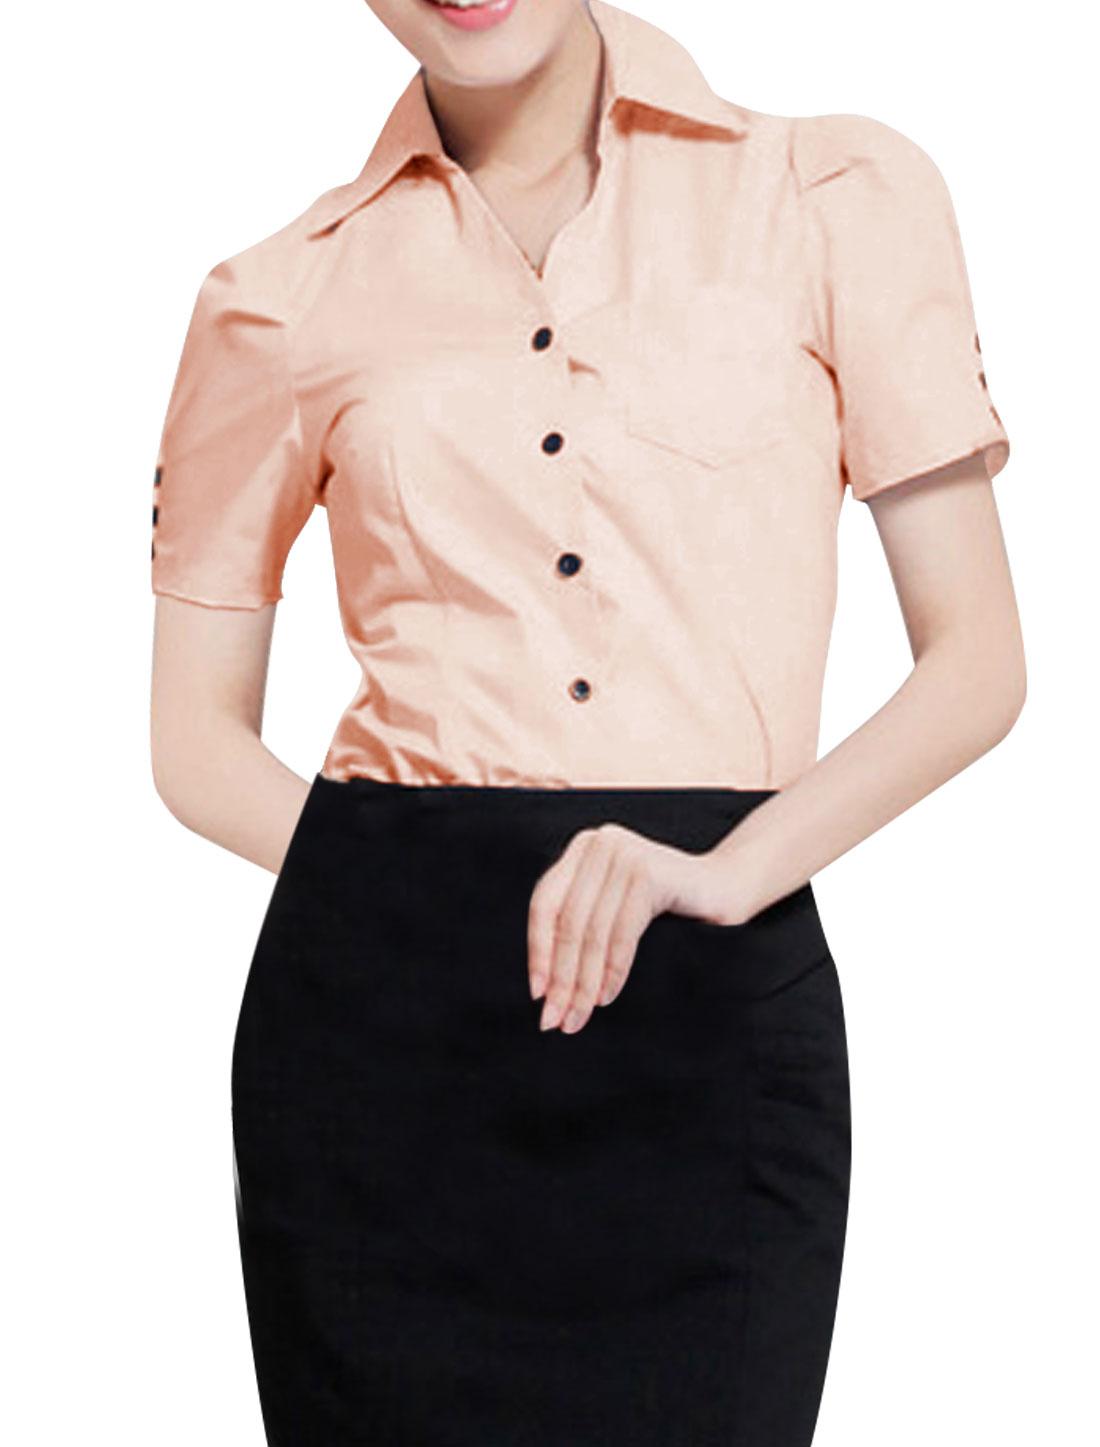 Fashion Women Point Collar Short Sleeve Shirt Pink L